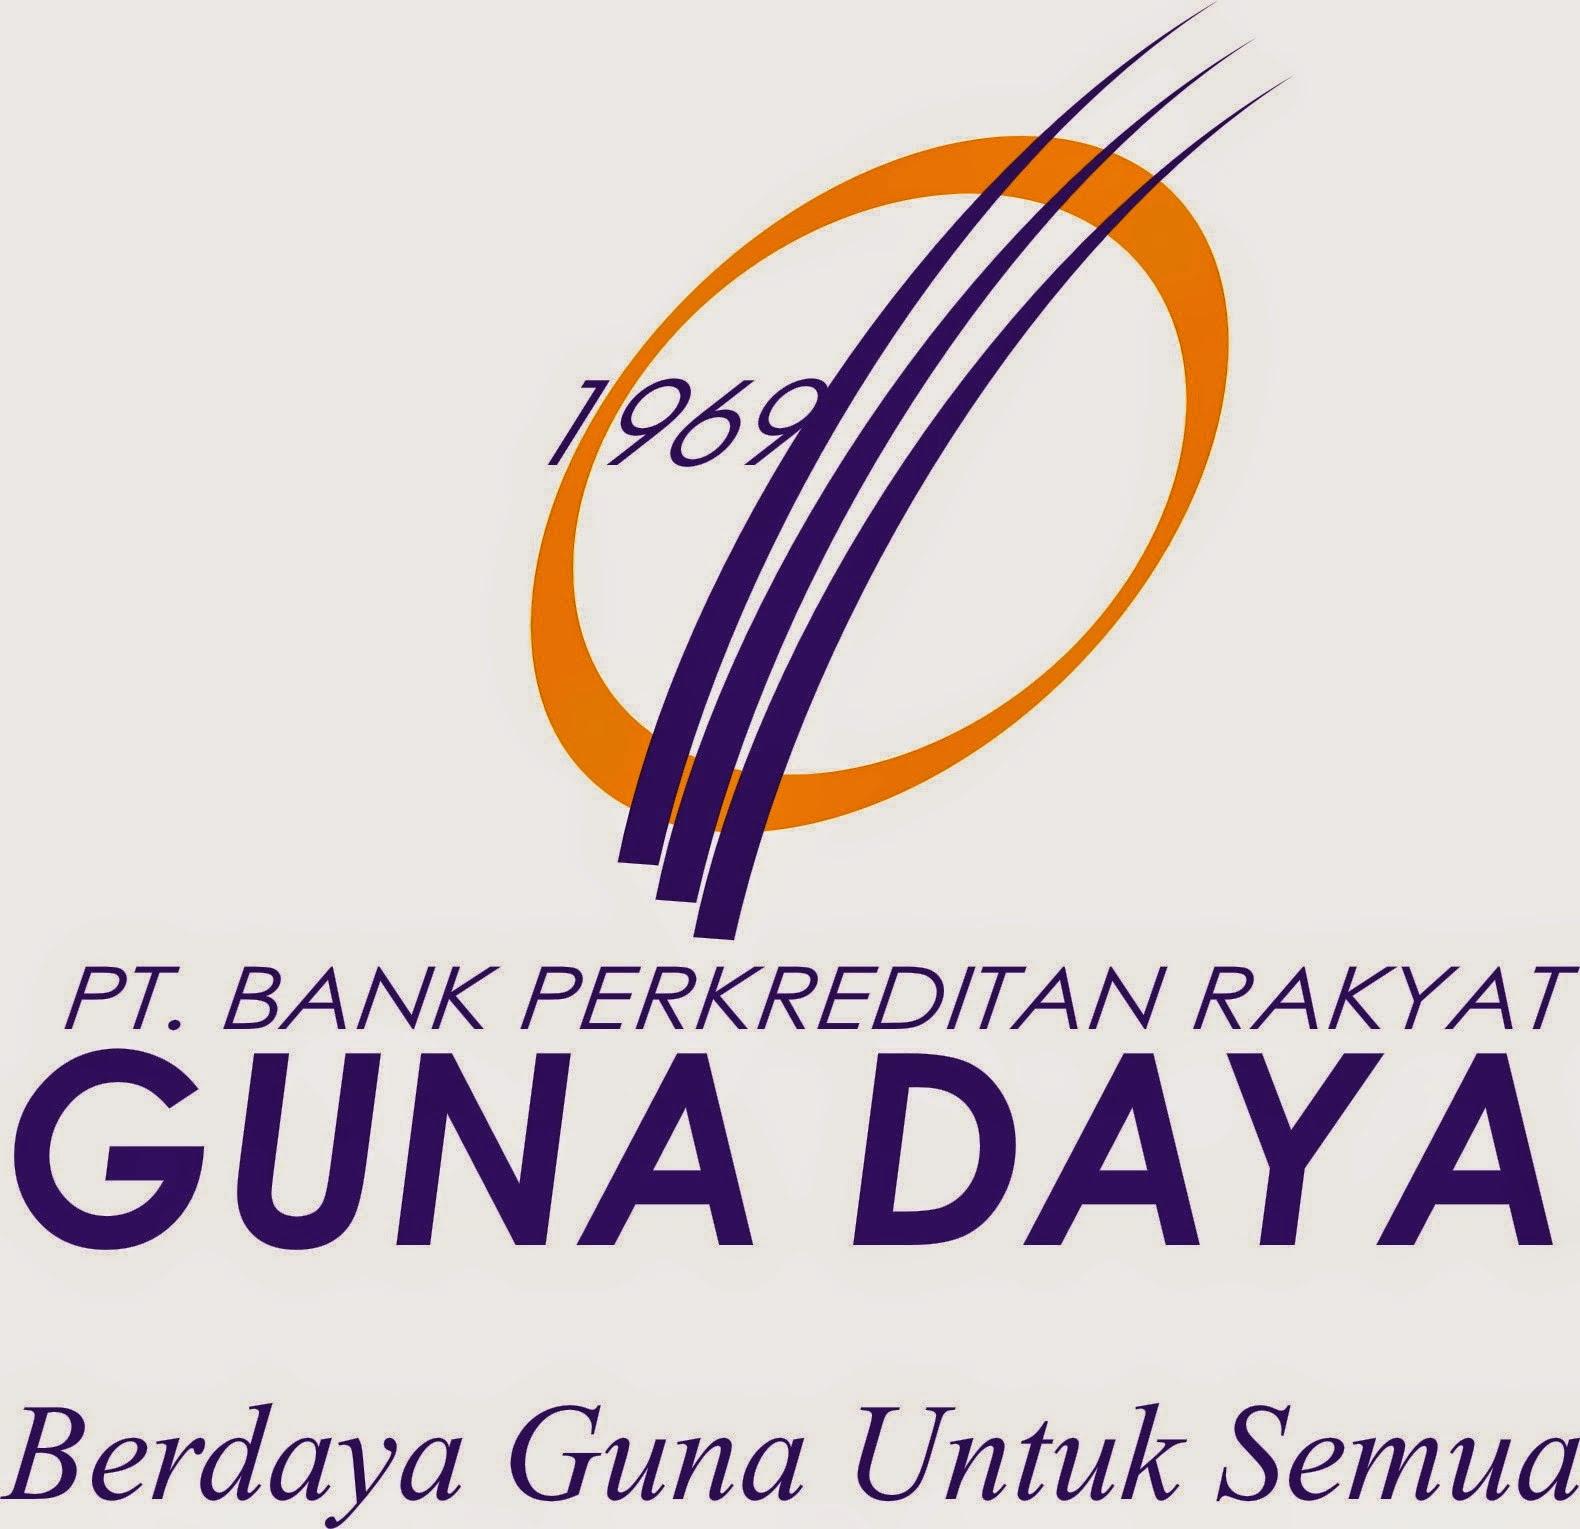 infolokersoloraya.blogspot.com Terbaru April 2014 di PT BPR Guna Daya - Boyolali